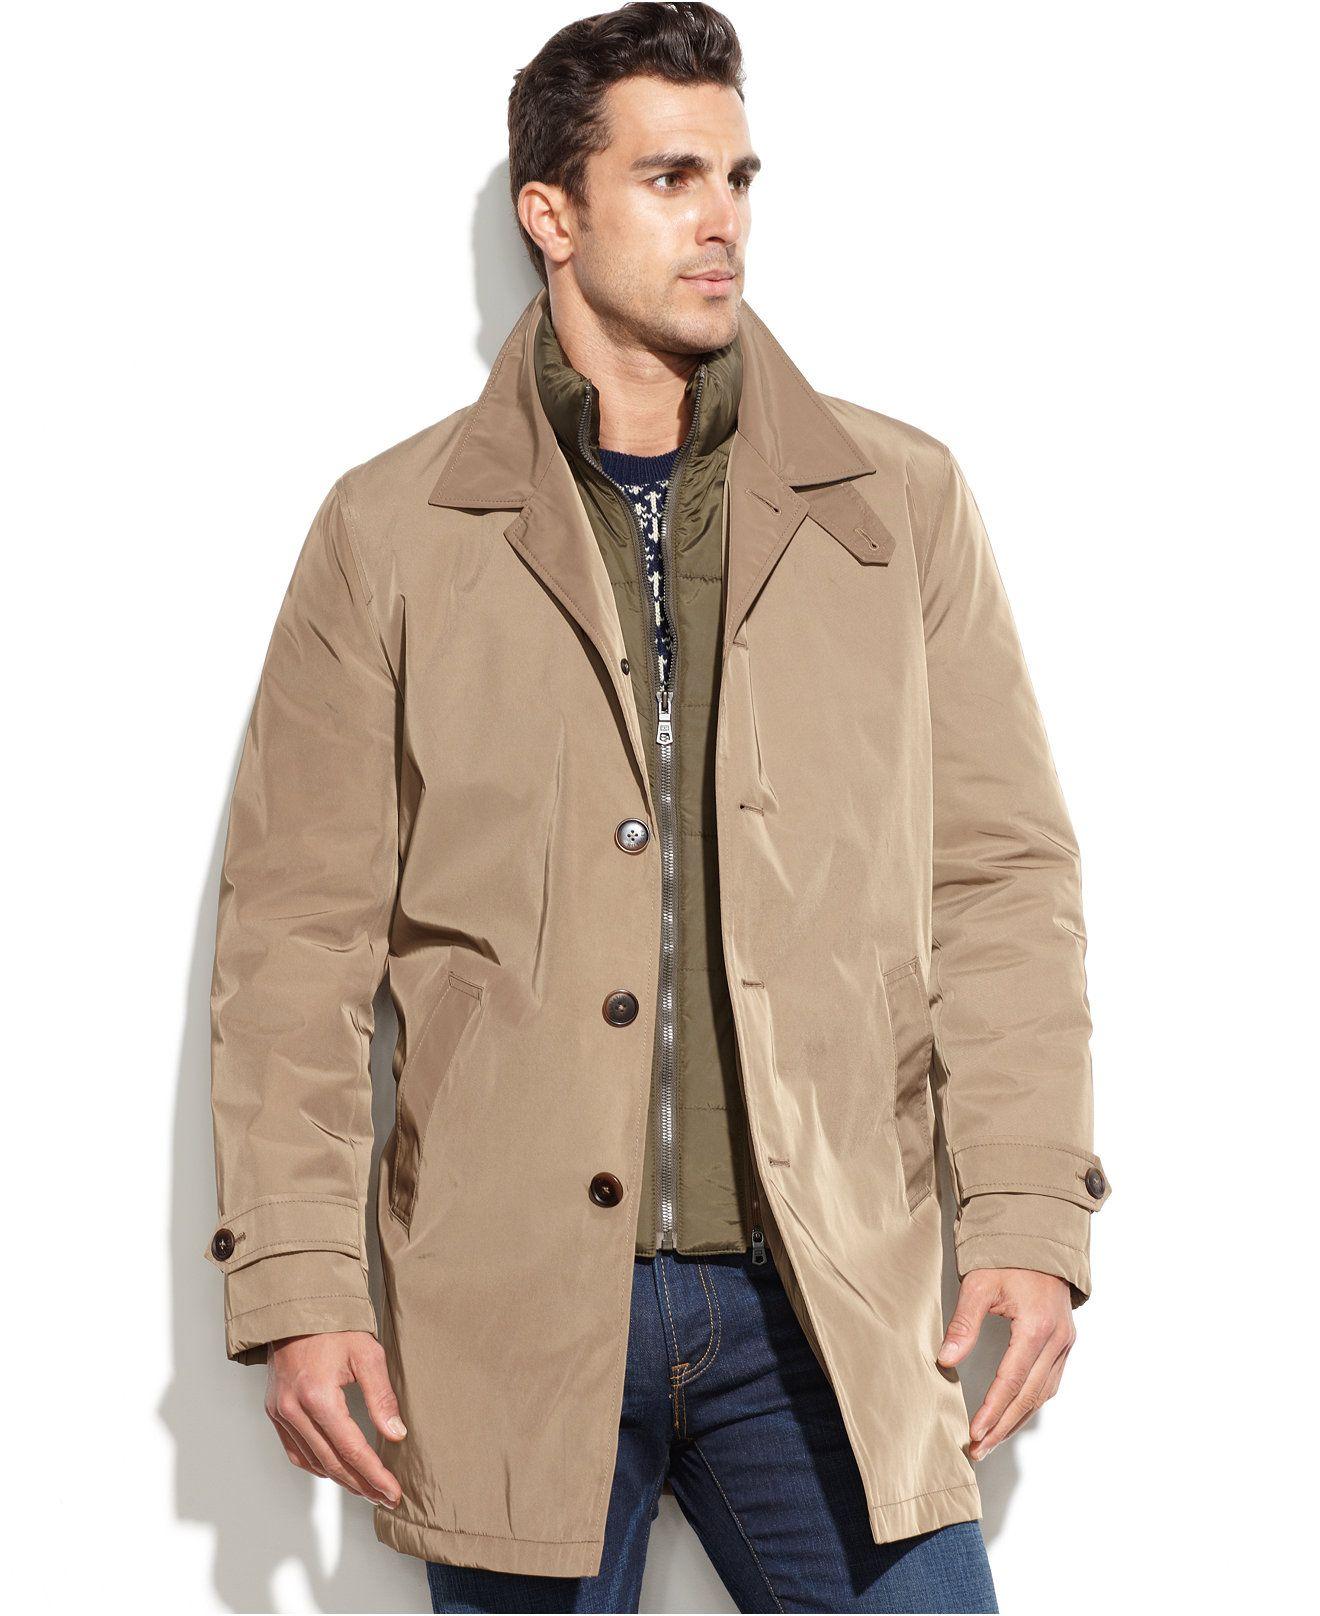 Tommy Hilfiger Puffer Bib Trench Coat Coats Jackets Men Macy S Mens Fashion Suits Formal Coat Mens Fashion Suits [ 1616 x 1320 Pixel ]